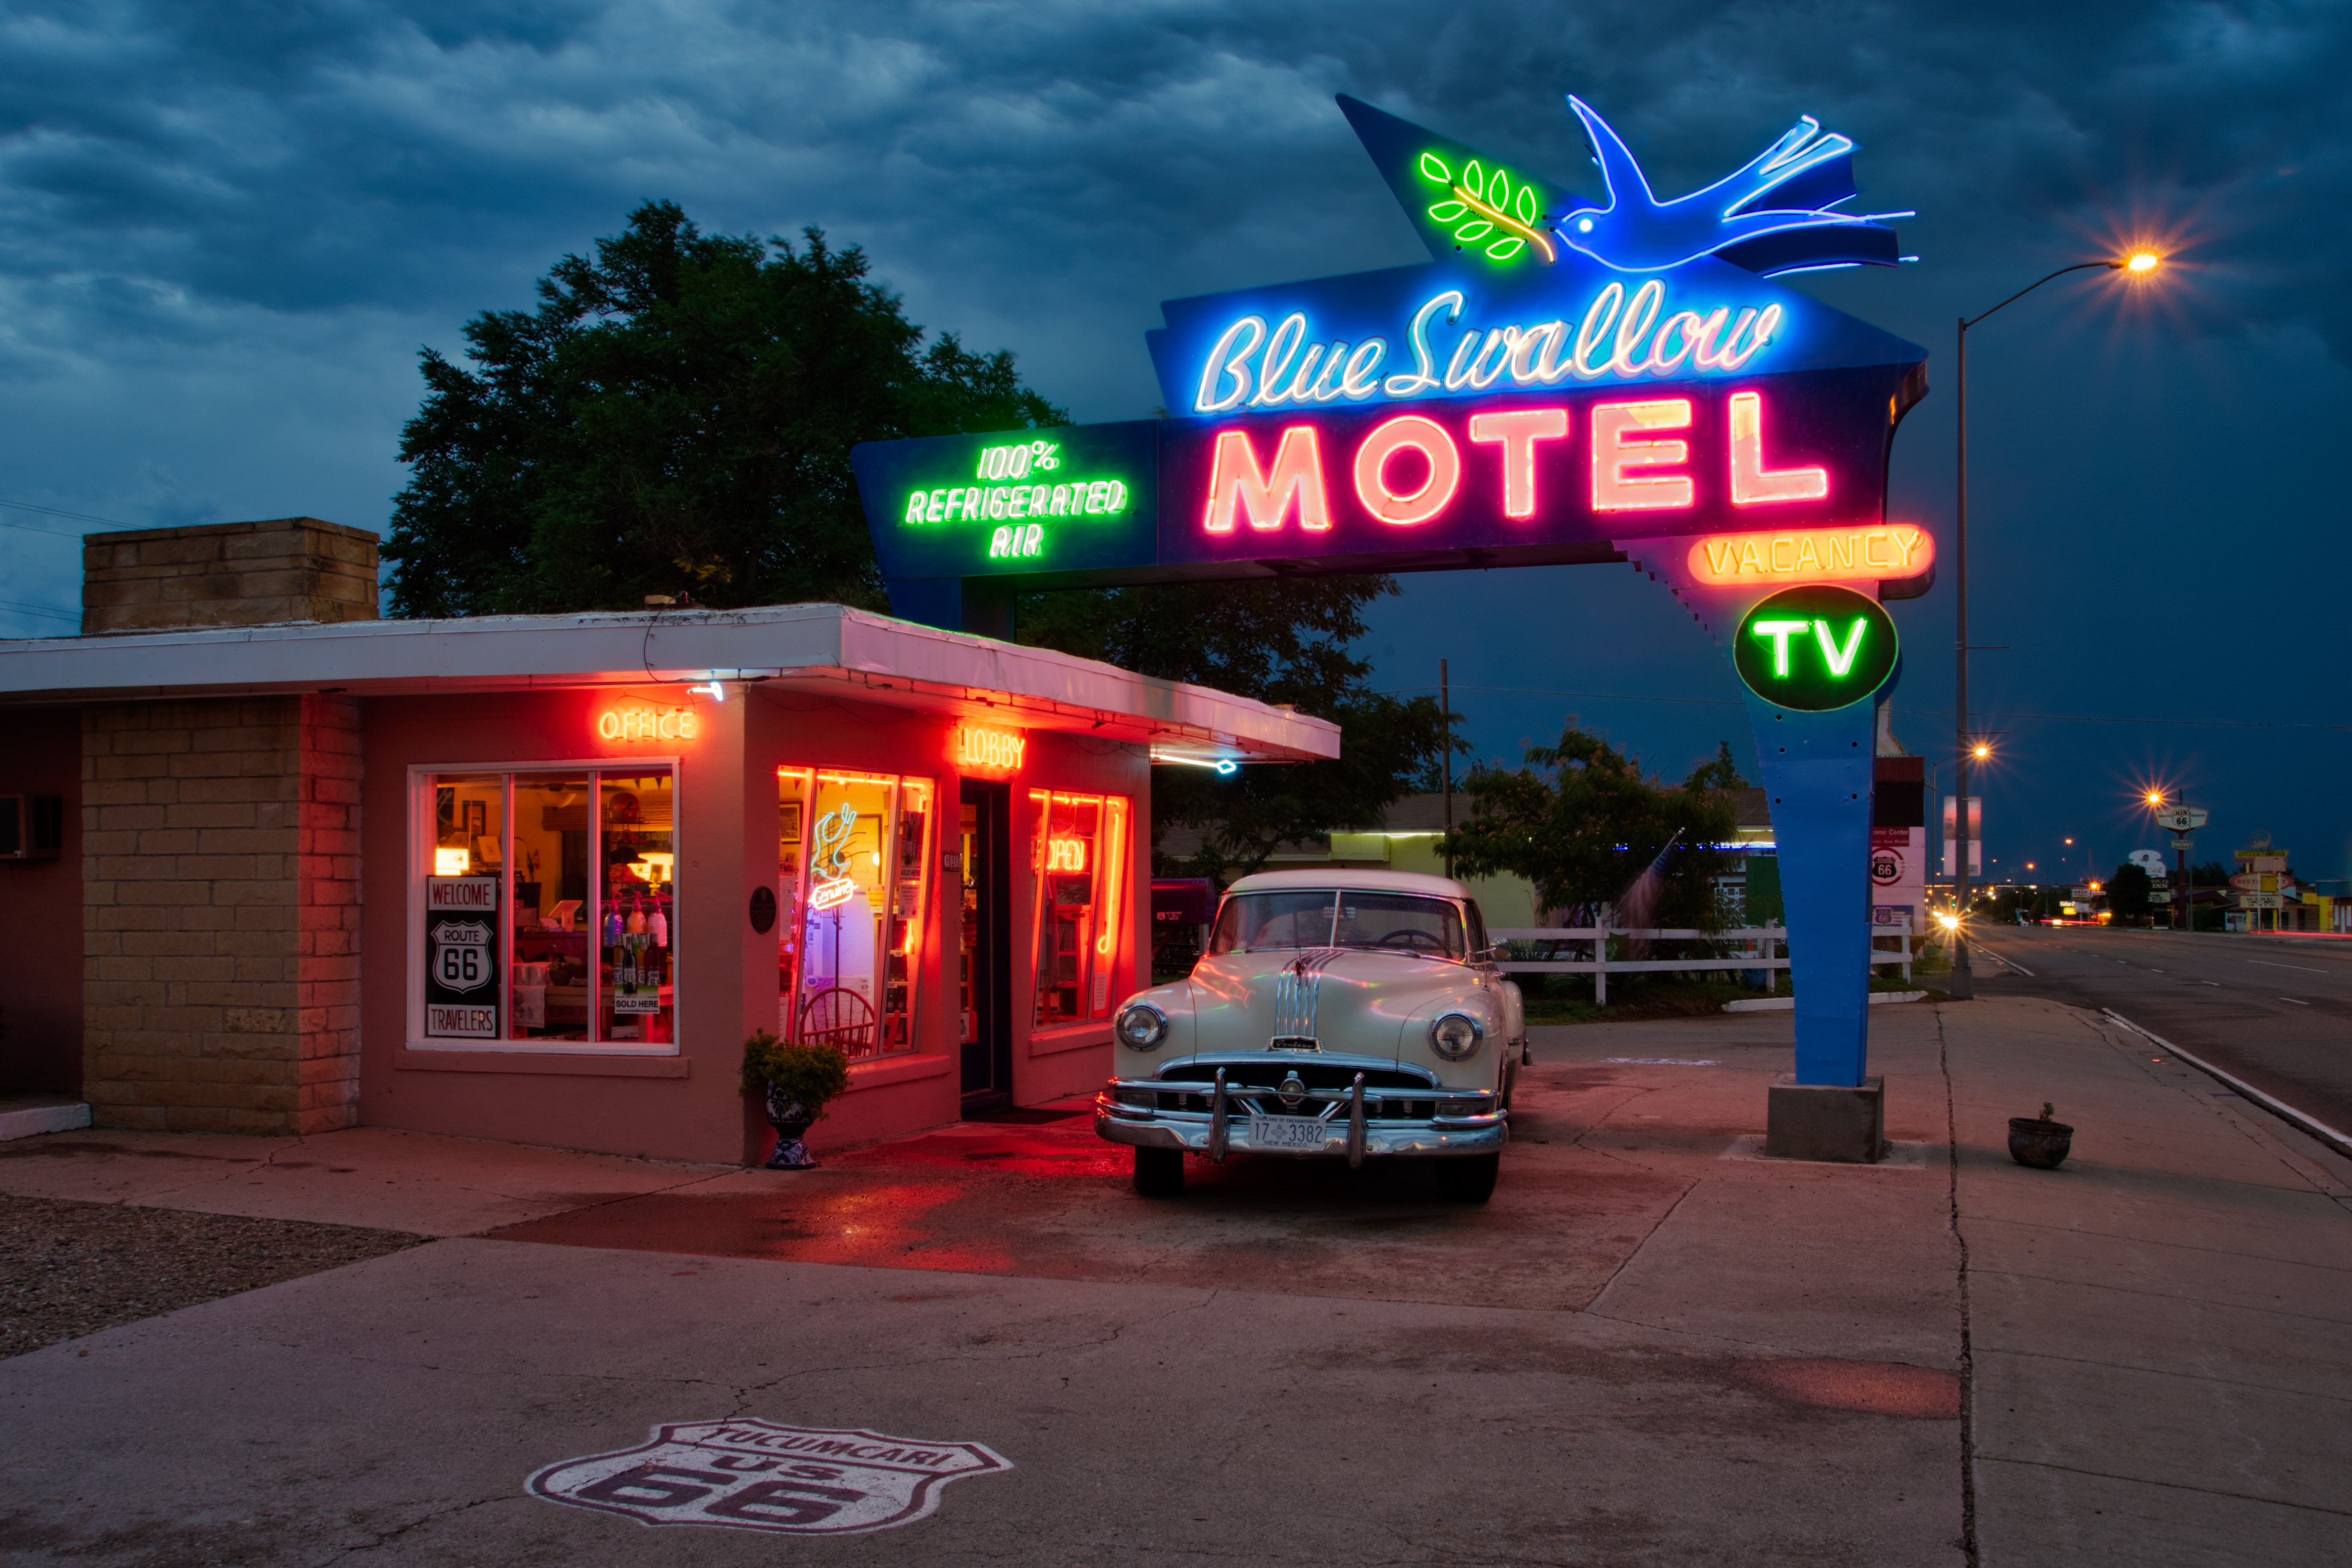 Blue Swallow Motel - 815 East Route 66 Boulevard, Tucumcari, New Mexico U.S.A. - August 20, 2017